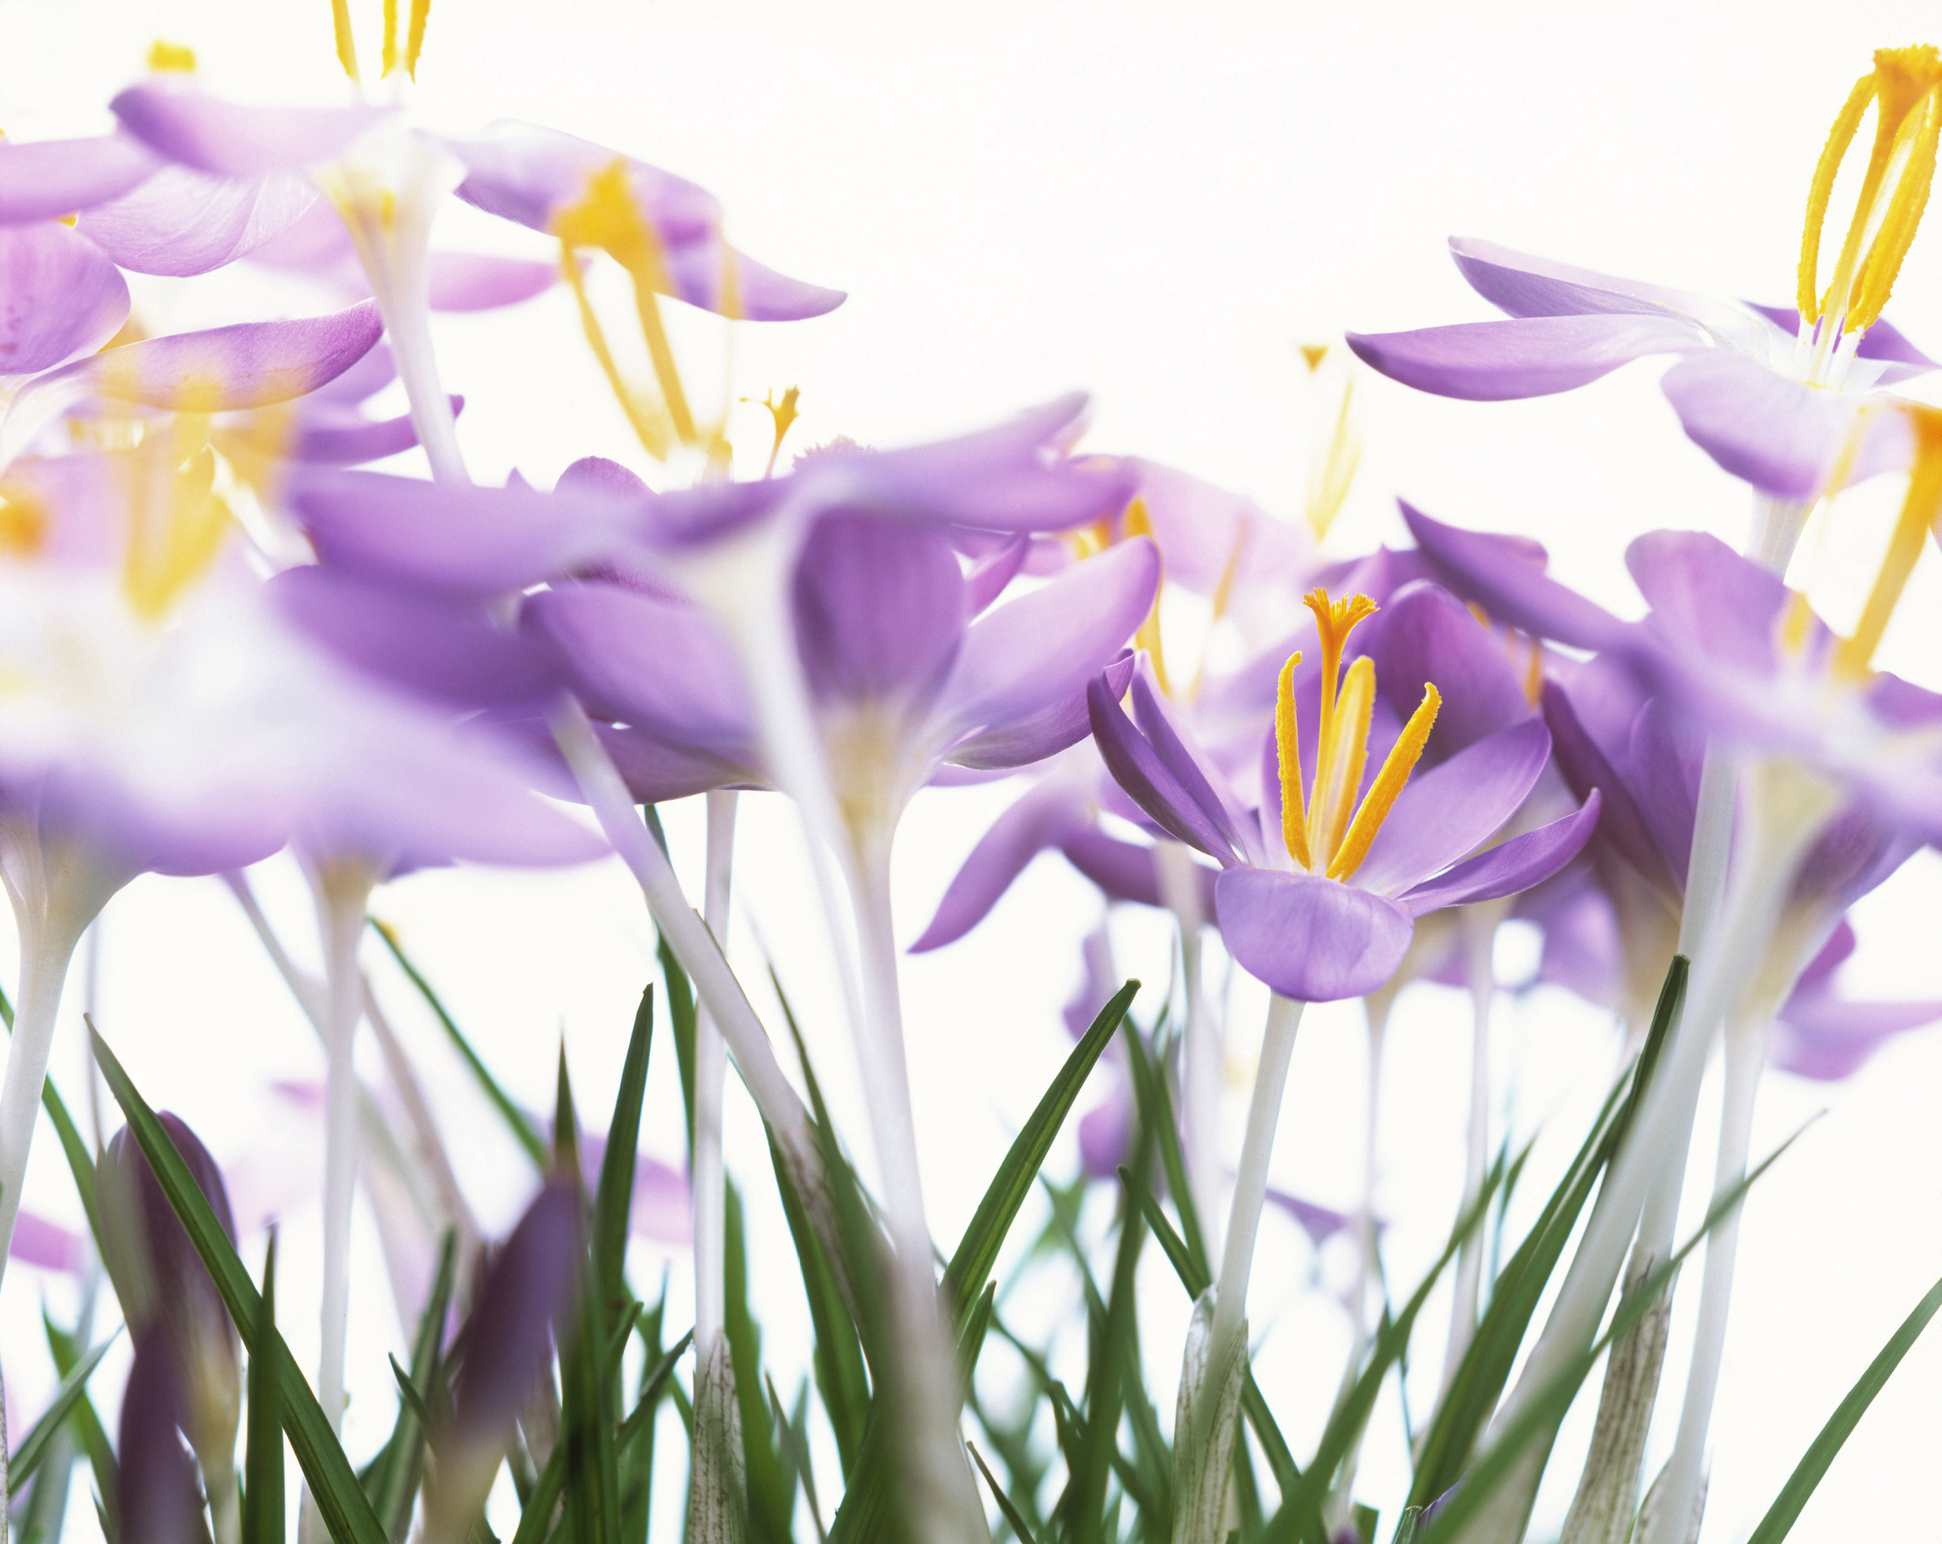 'Skyline' crocus with purple petals